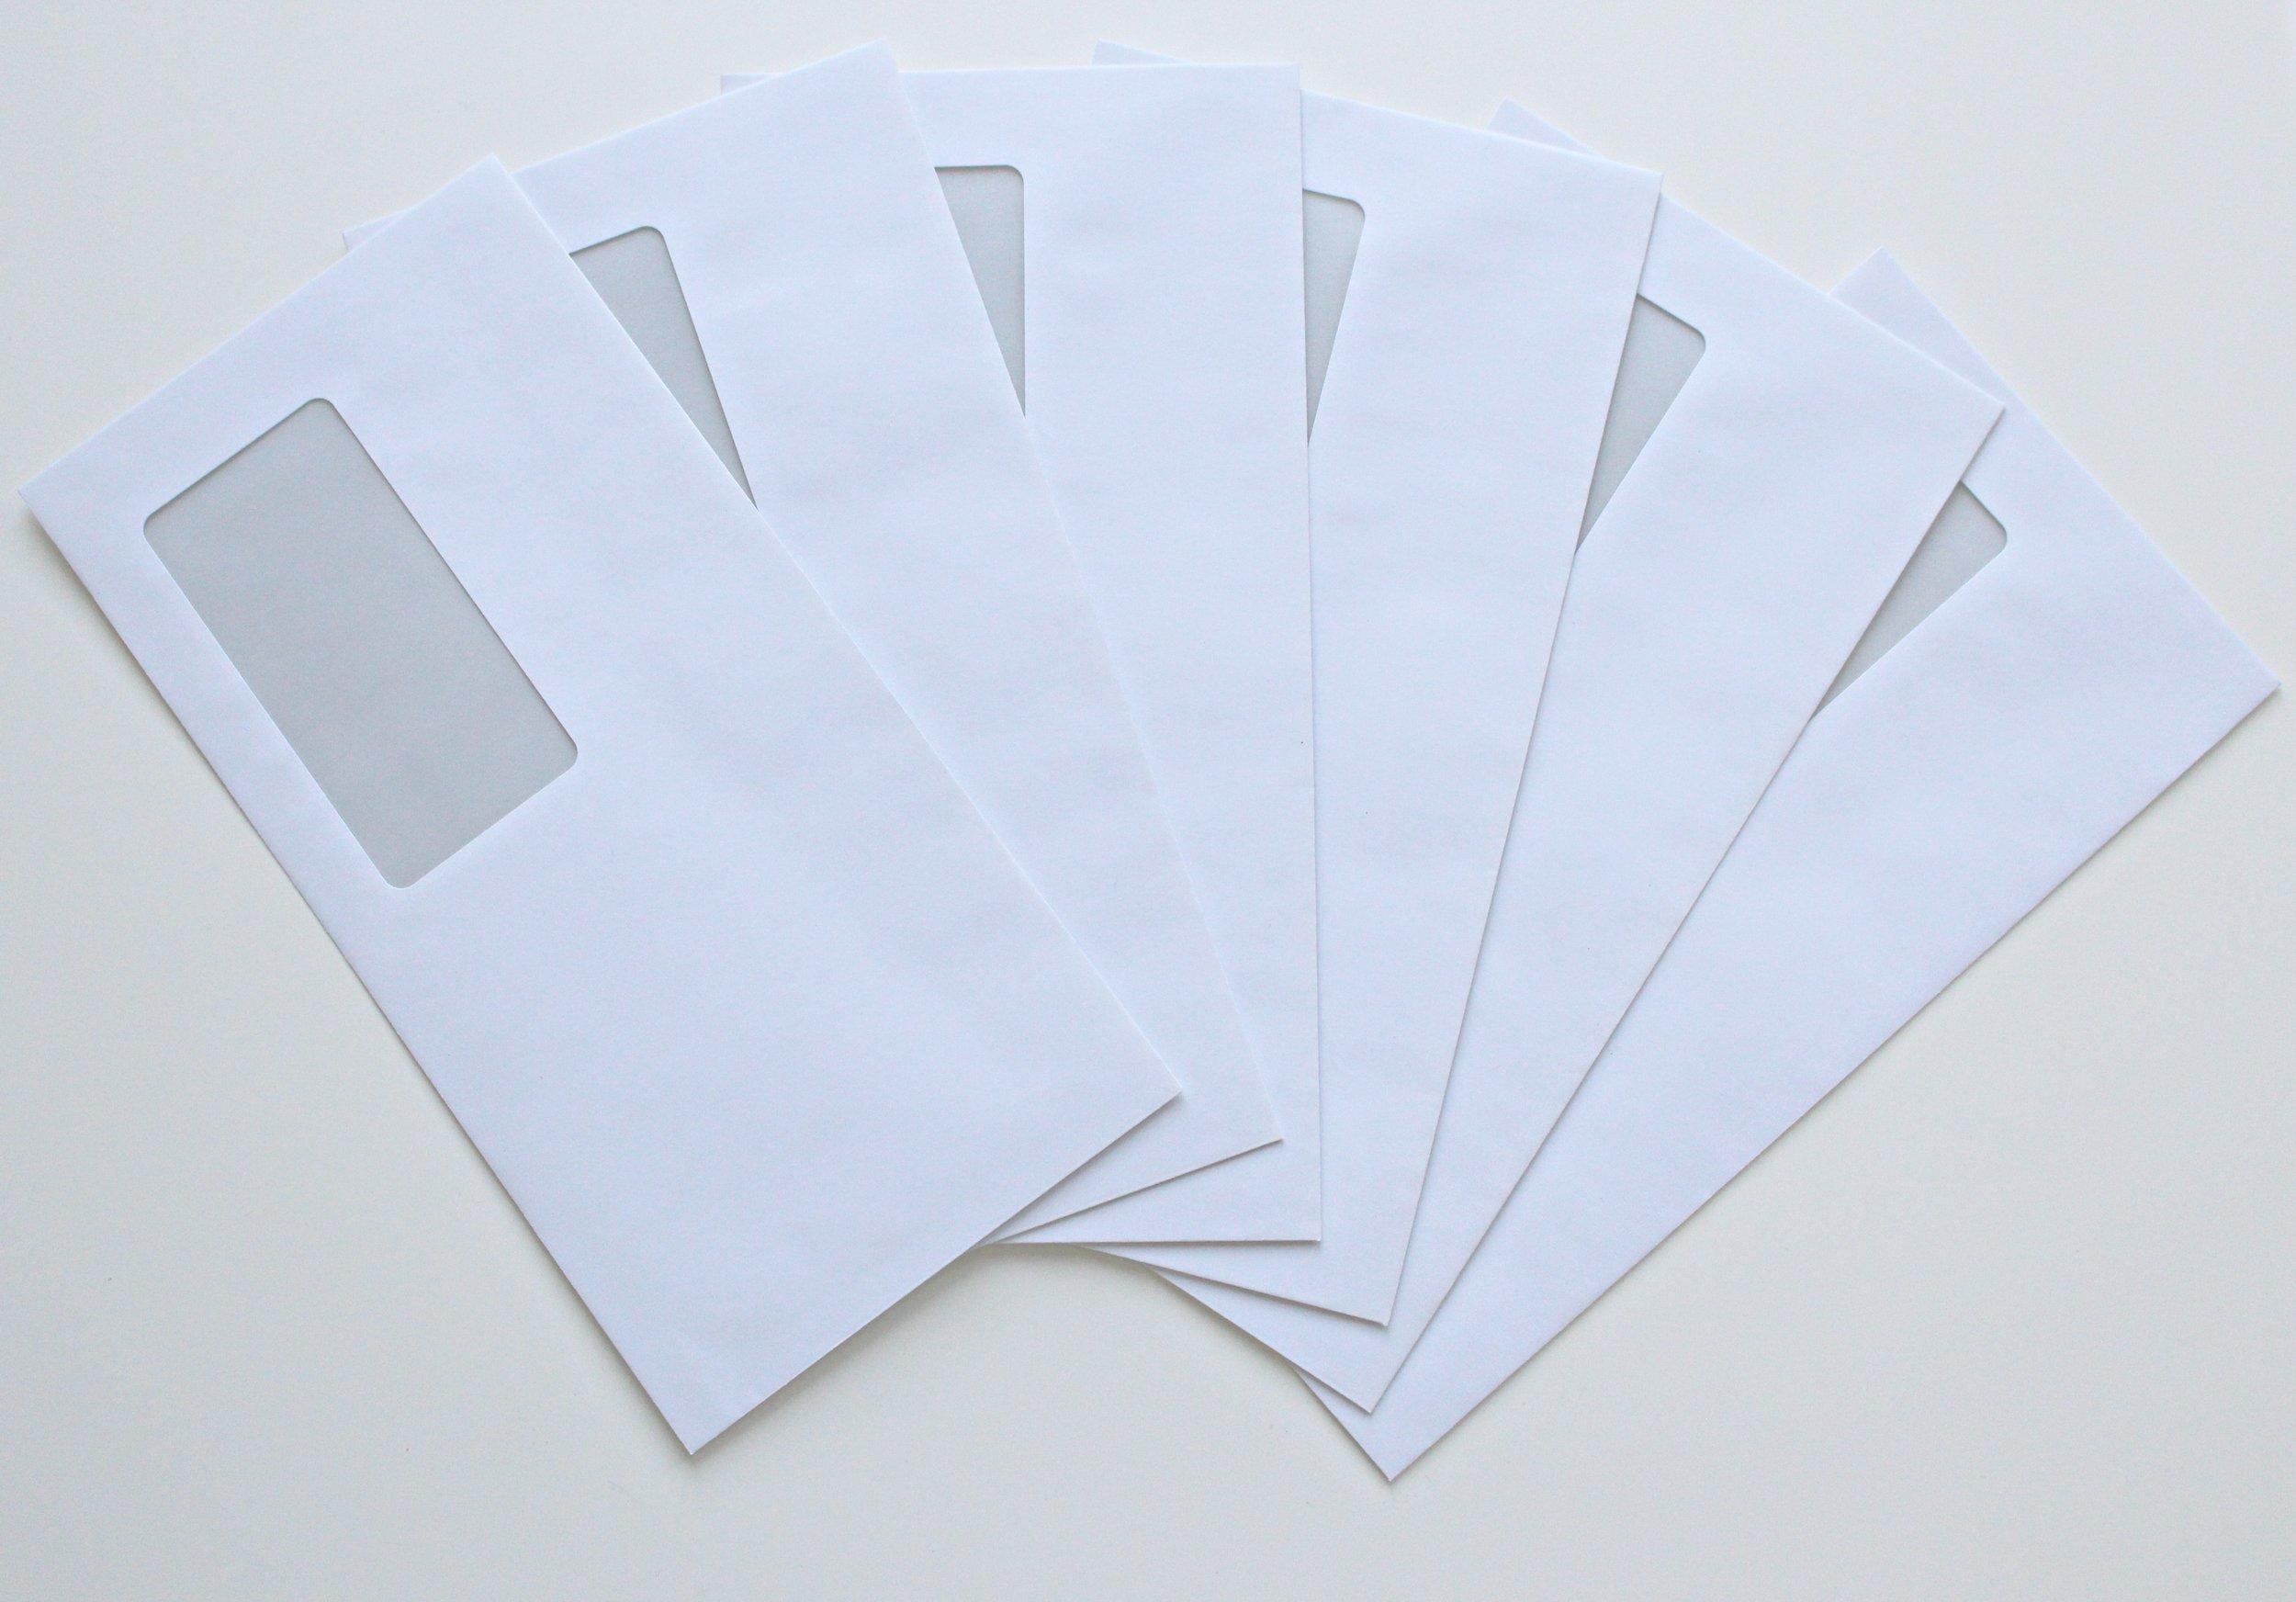 blank-card-communication-248537.jpg